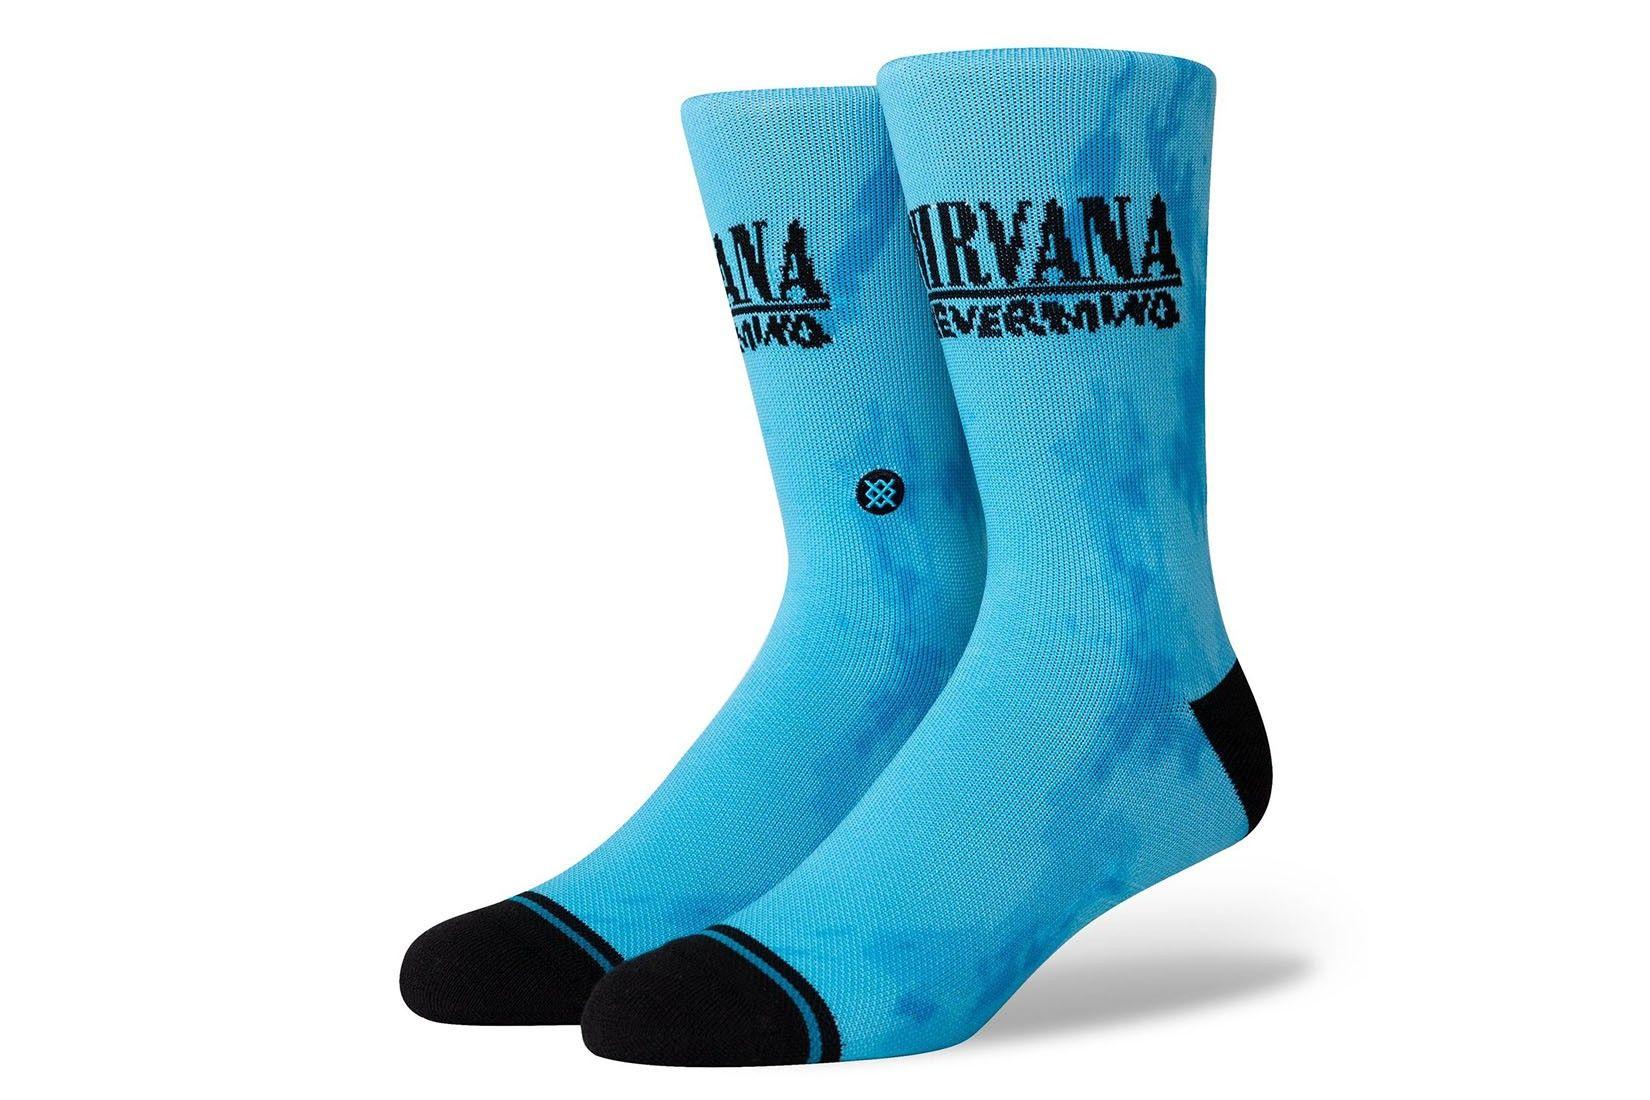 Afbeelding van Stance Sokken Nirvana Nevermind Blue A558A20Nin